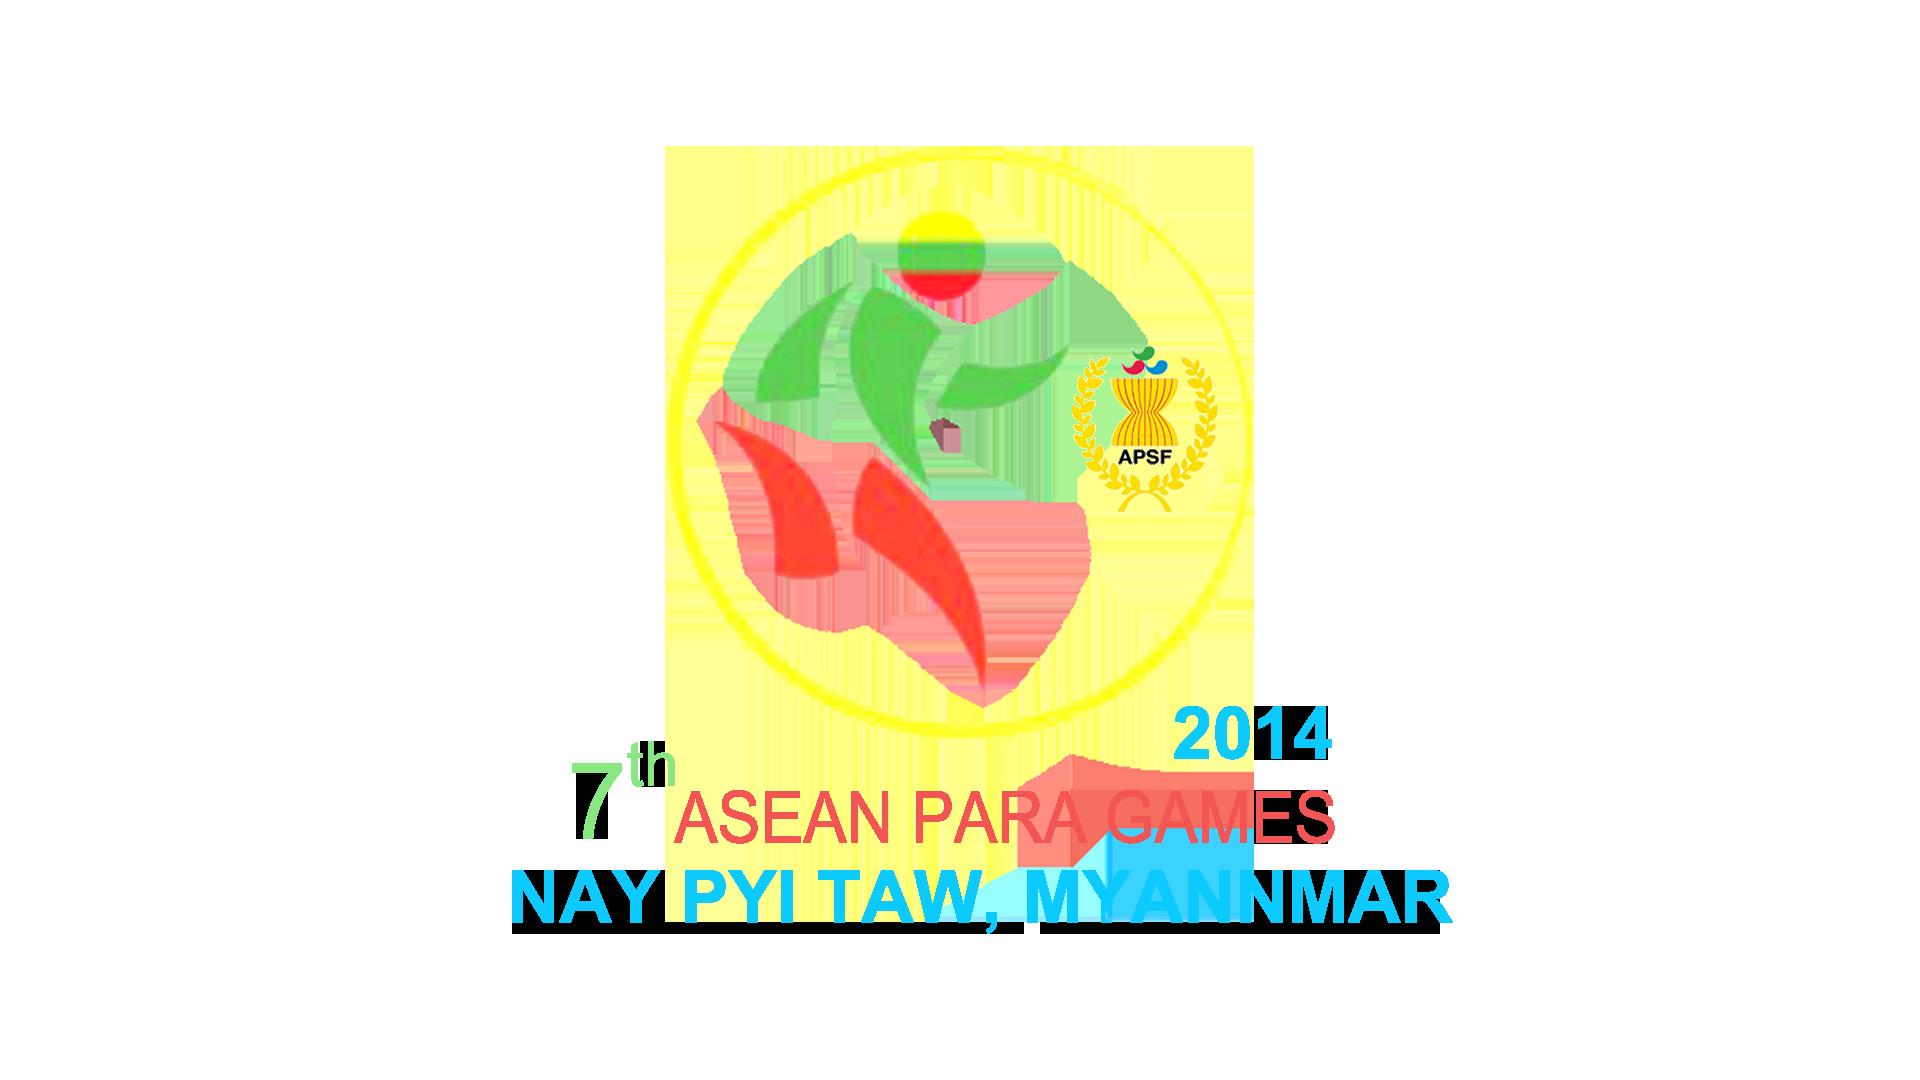 Asean Para Games Logo Besar